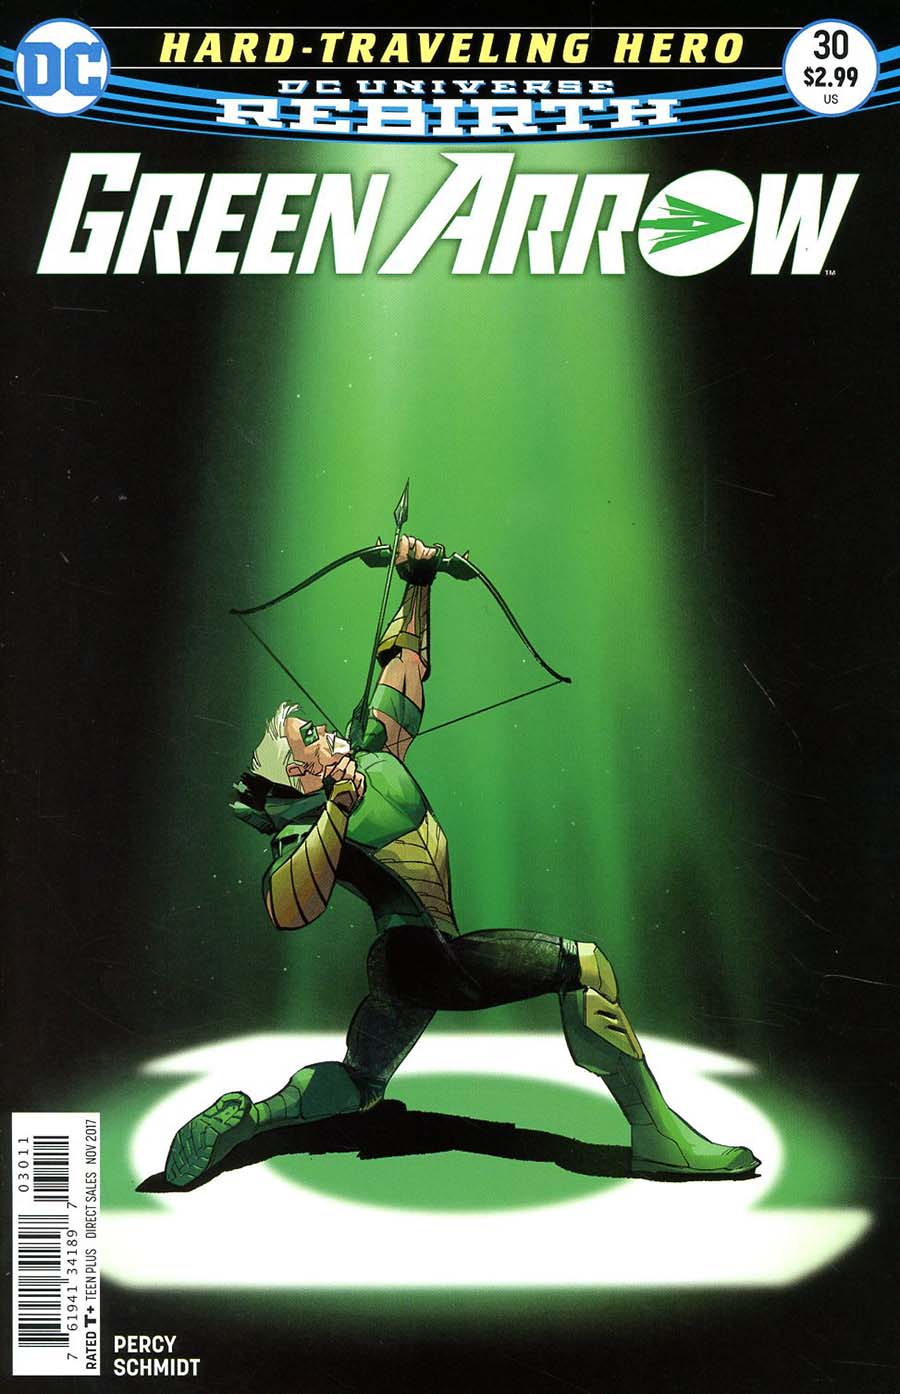 Green Arrow Vol 7 #30 Cover A Regular Otto Schmidt Cover